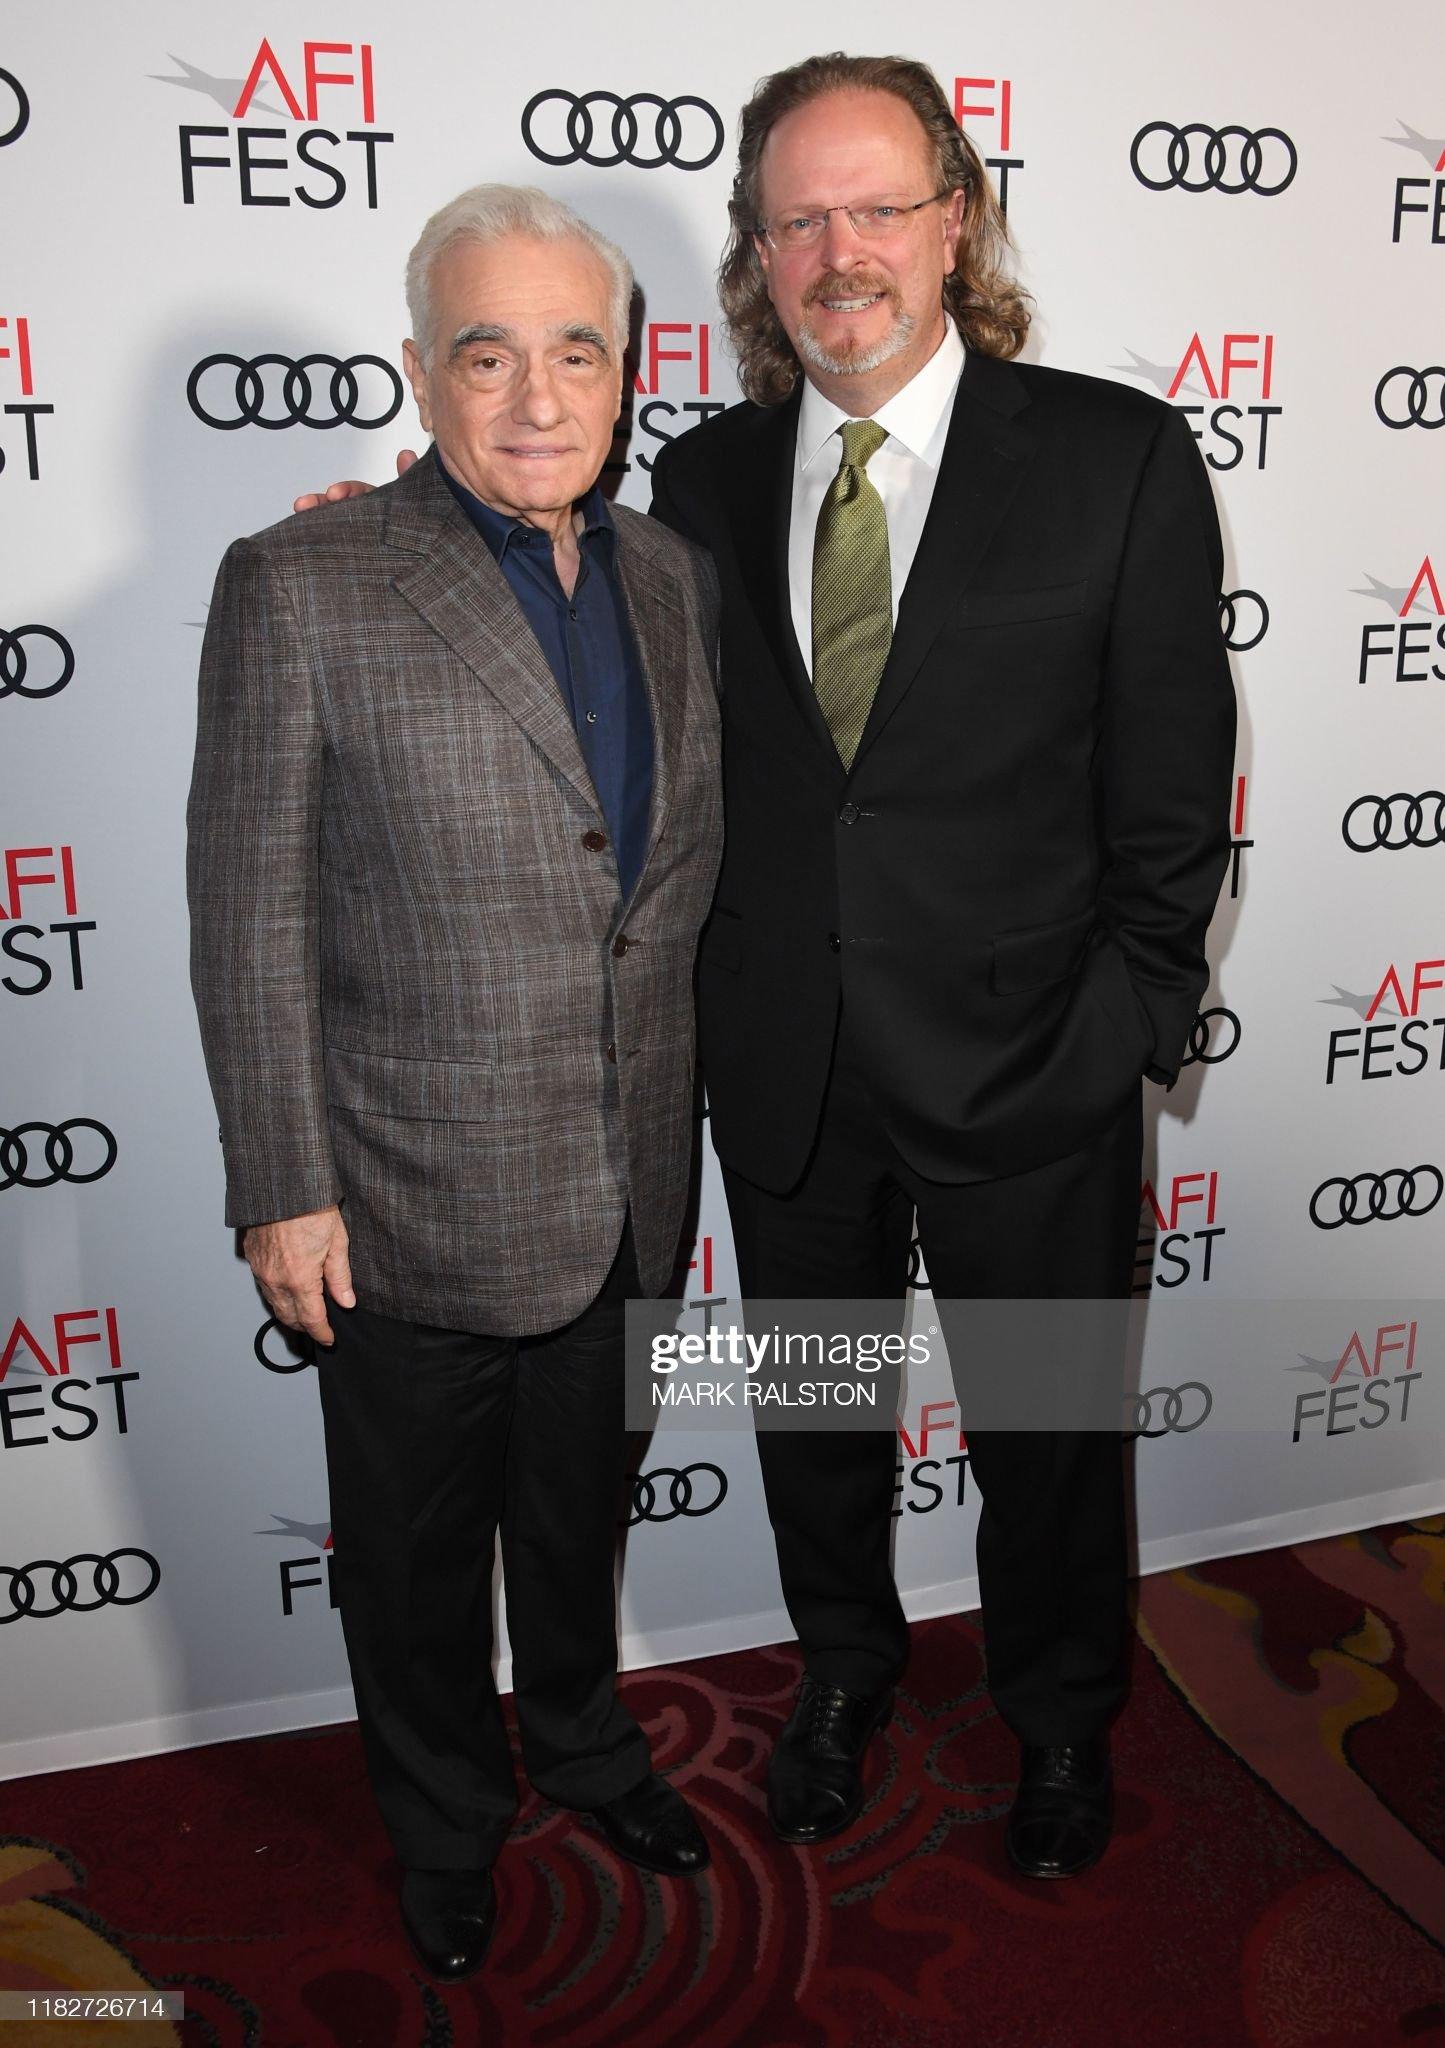 ¿Cuánto mide Martin Scorsese? - Altura - Real height Usitalian-filmmaker-martin-scorsese-and-afi-president-bob-gazzale-picture-id1182726714?s=2048x2048